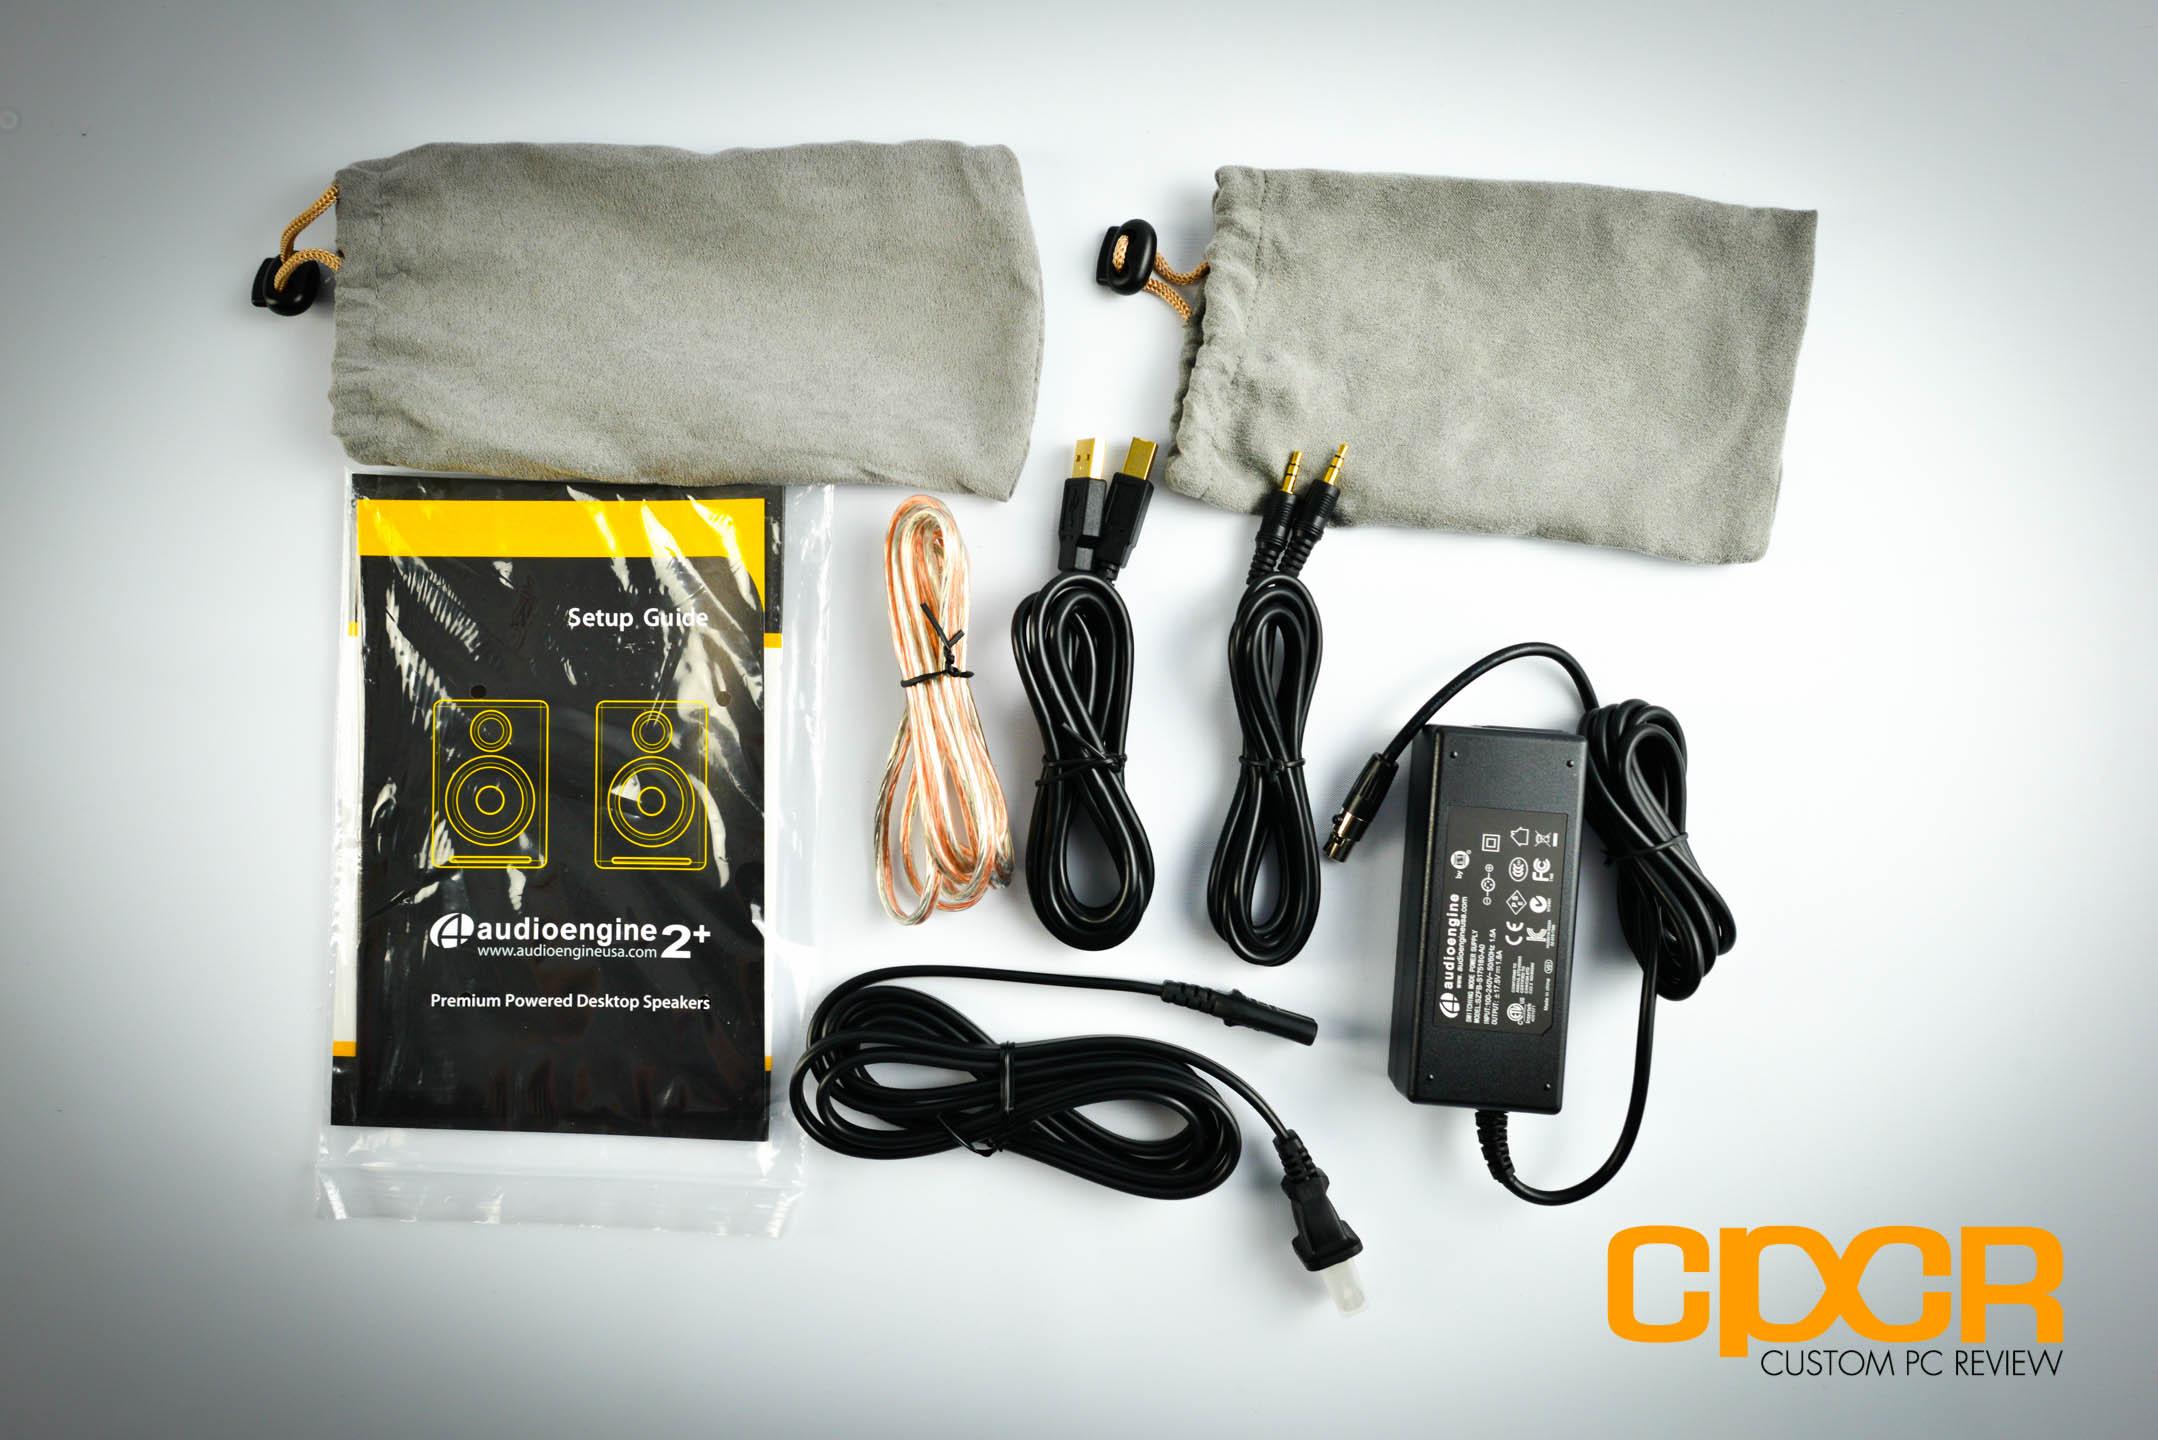 A2 premium powered desktop speakers youtube - Audioengine 2 Plus Powered Desktop Speakers Custom Pc